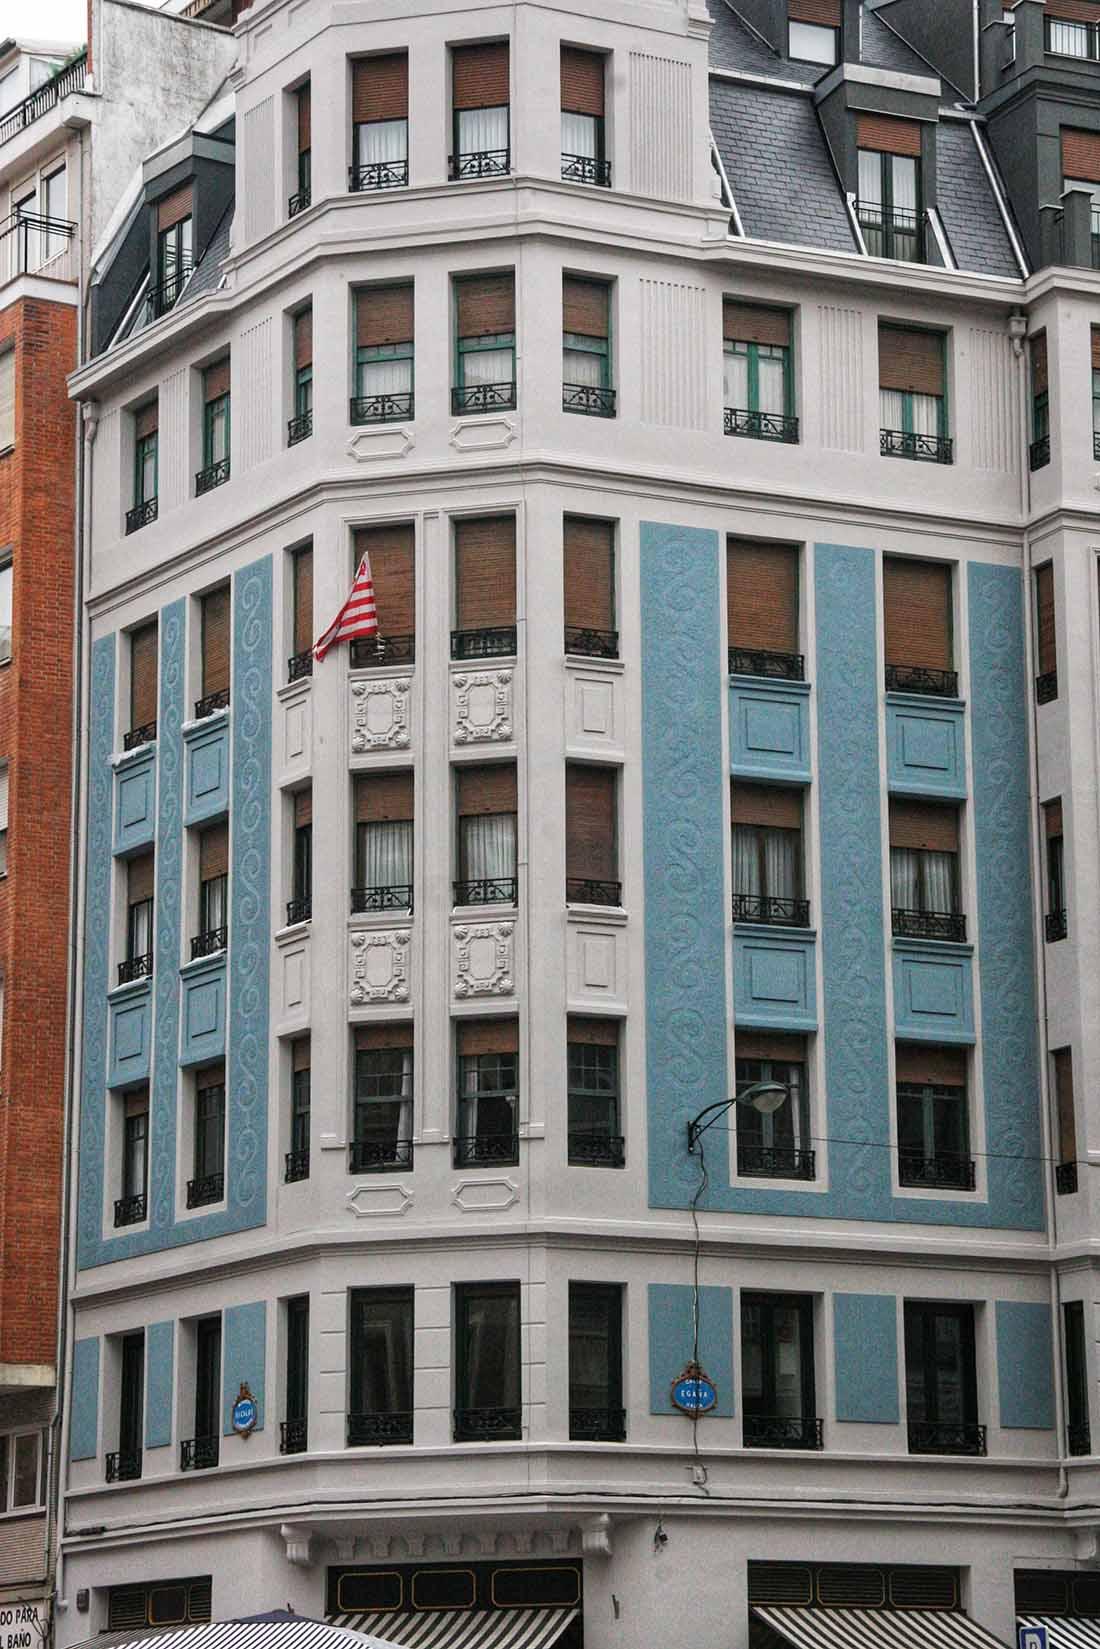 Rehabilitacion fachada edificio en la calle Egana de Bilbao 4